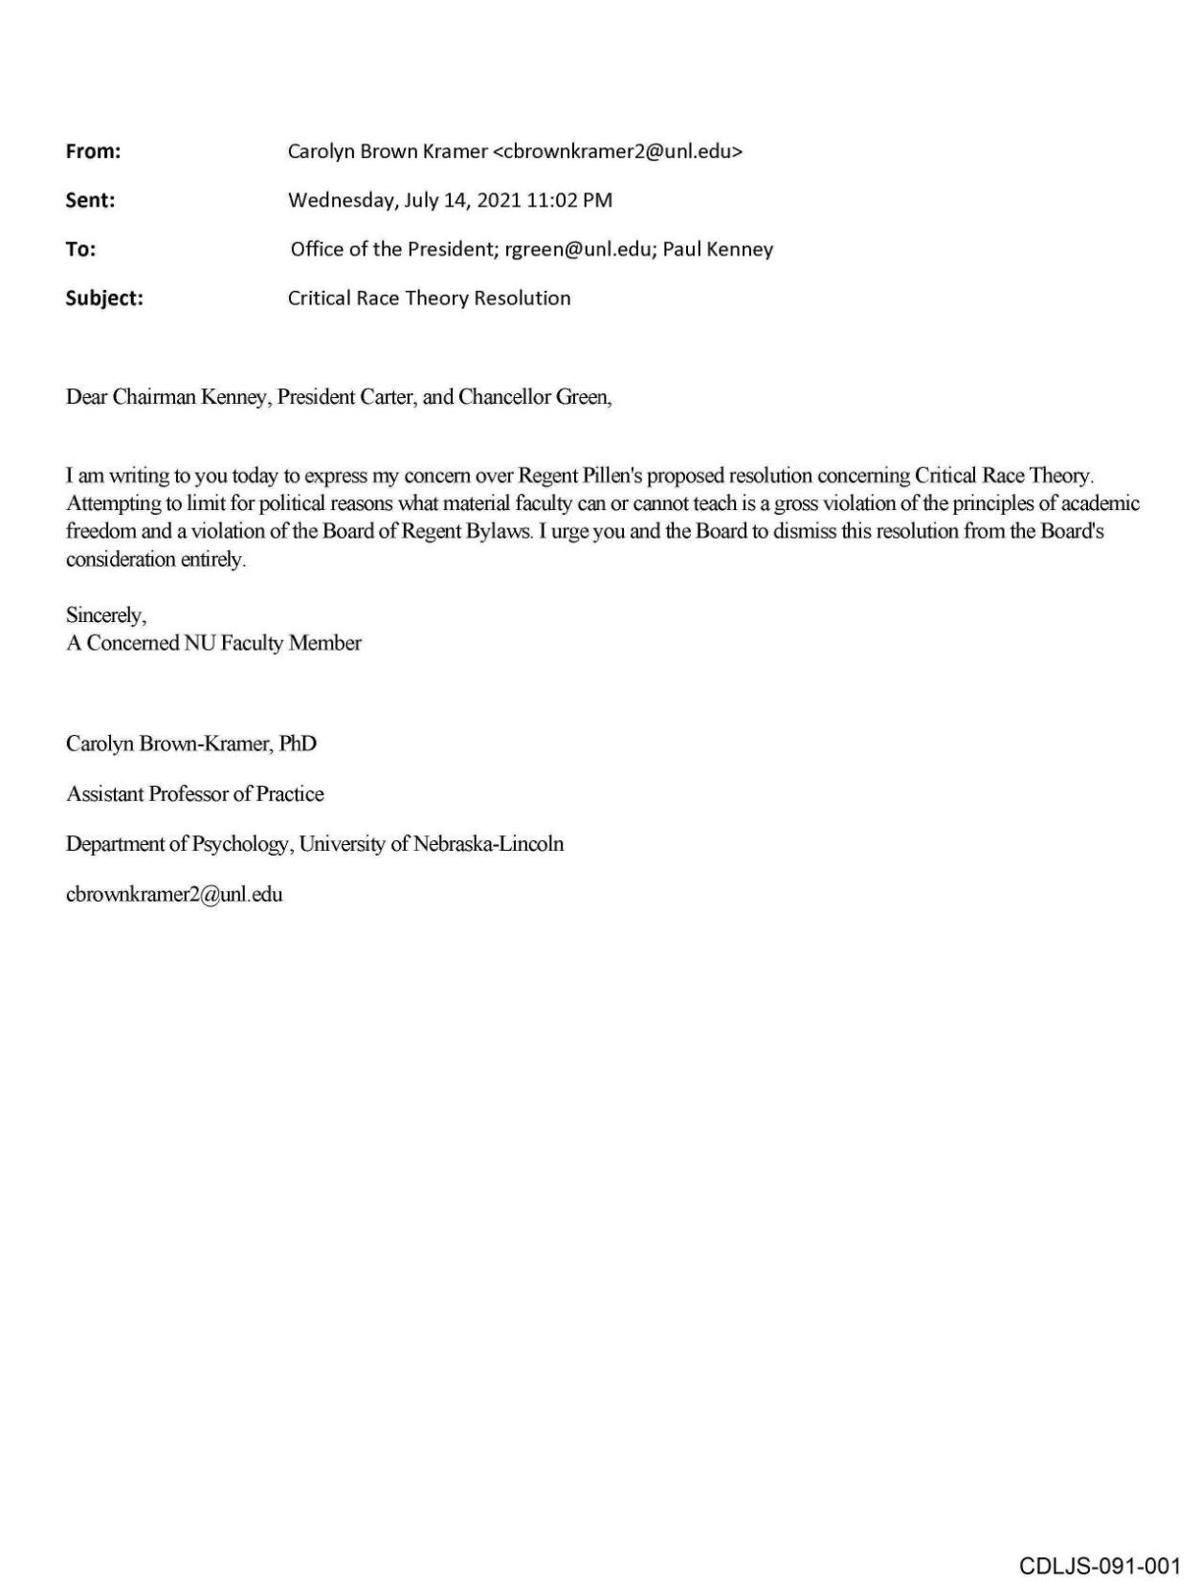 CDLJS-091-001.pdf